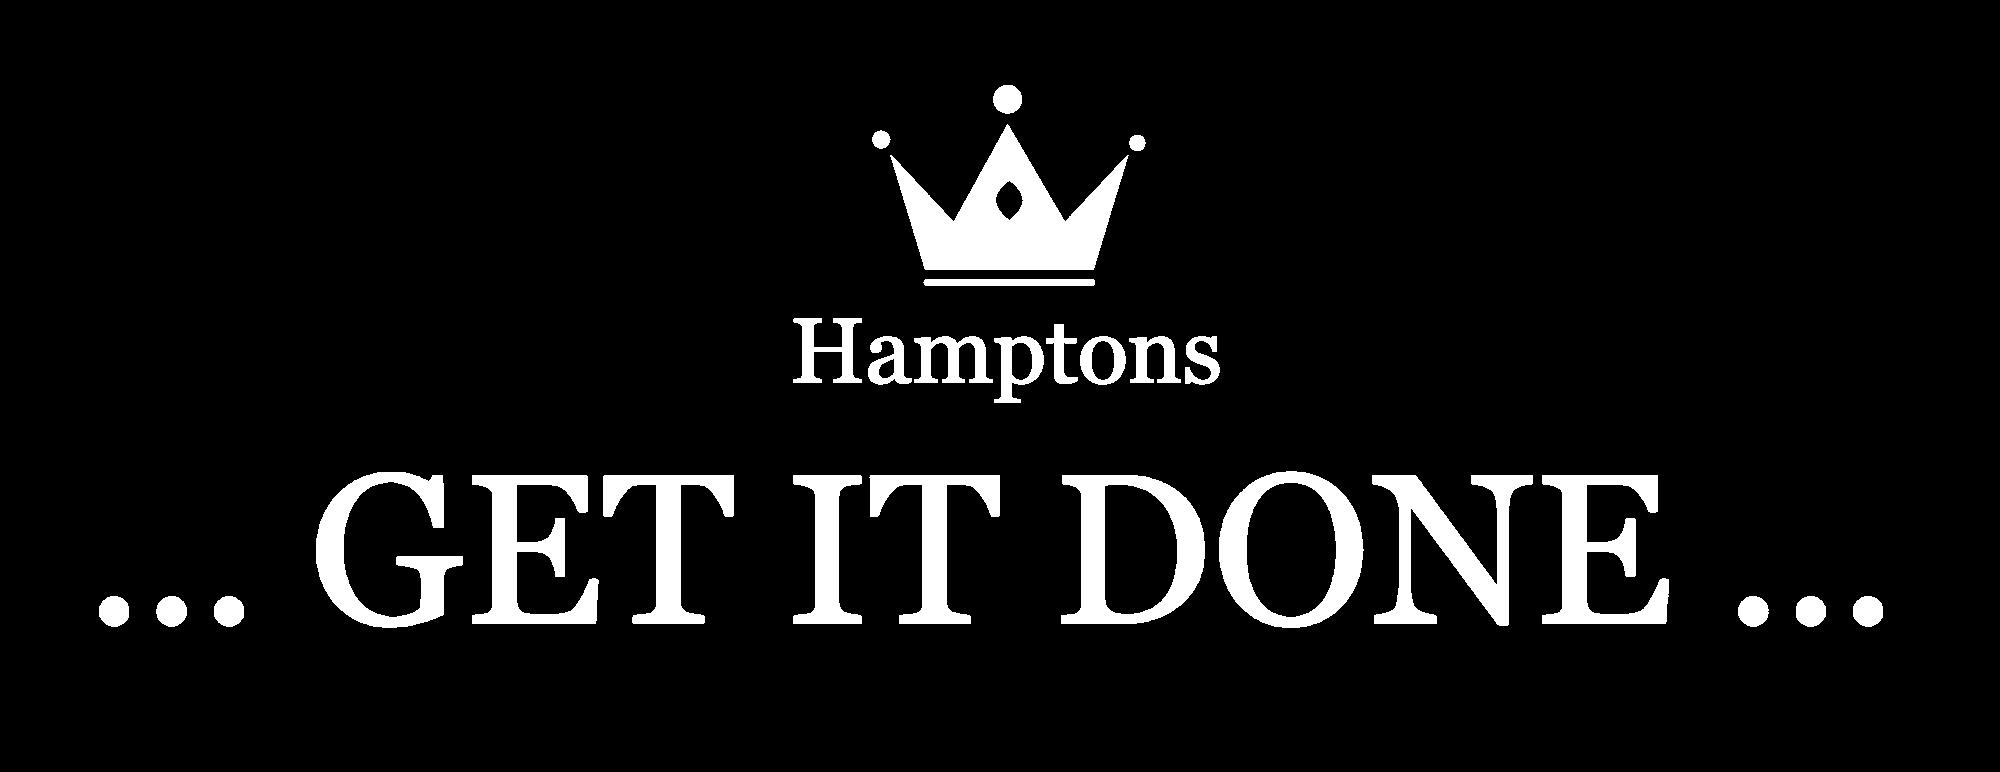 Hamptons-logo-white.png